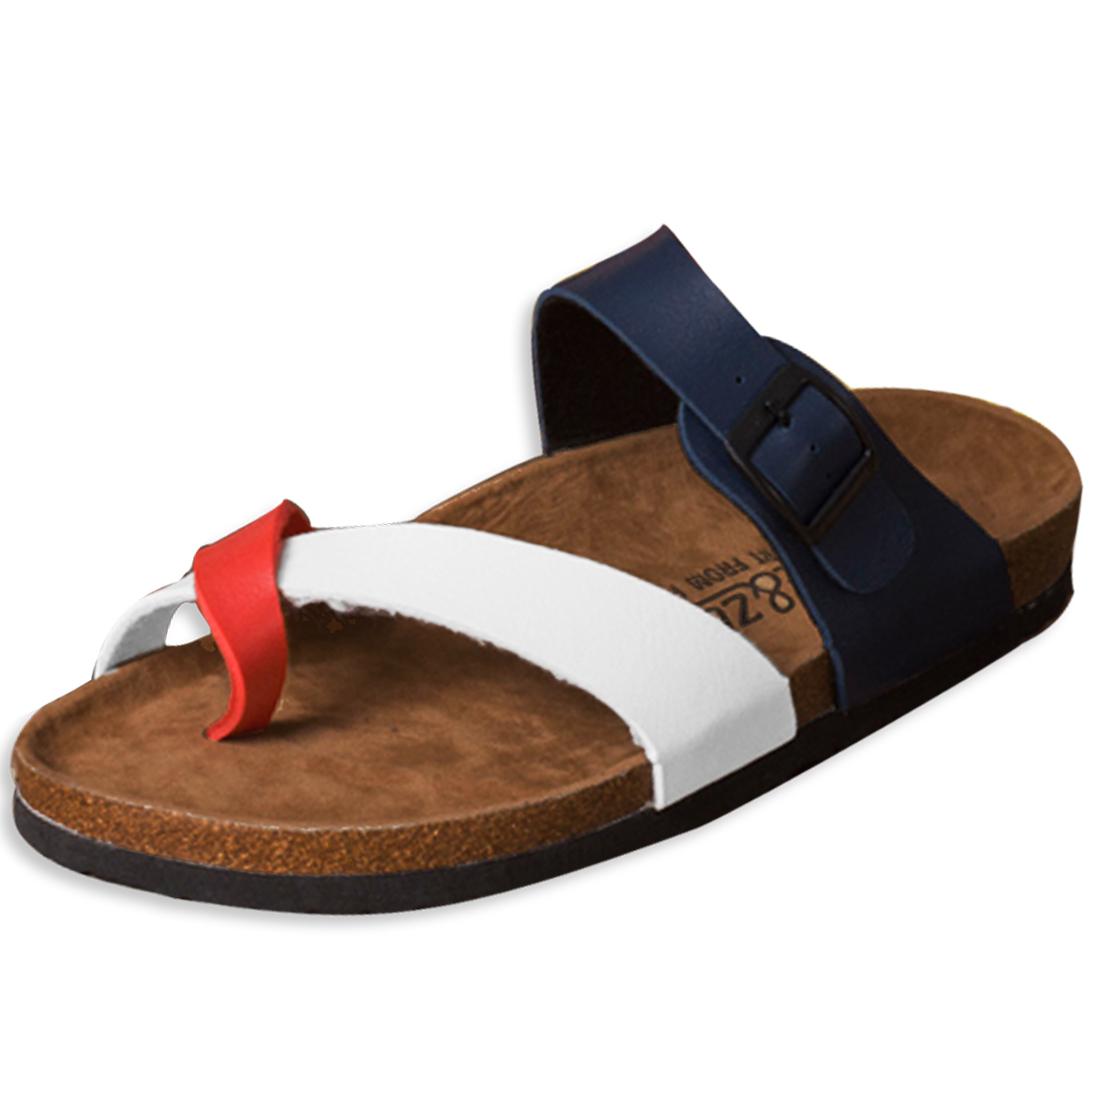 Unisex Functional Buckle Beach Sandals Dark Blue Red Size US 6